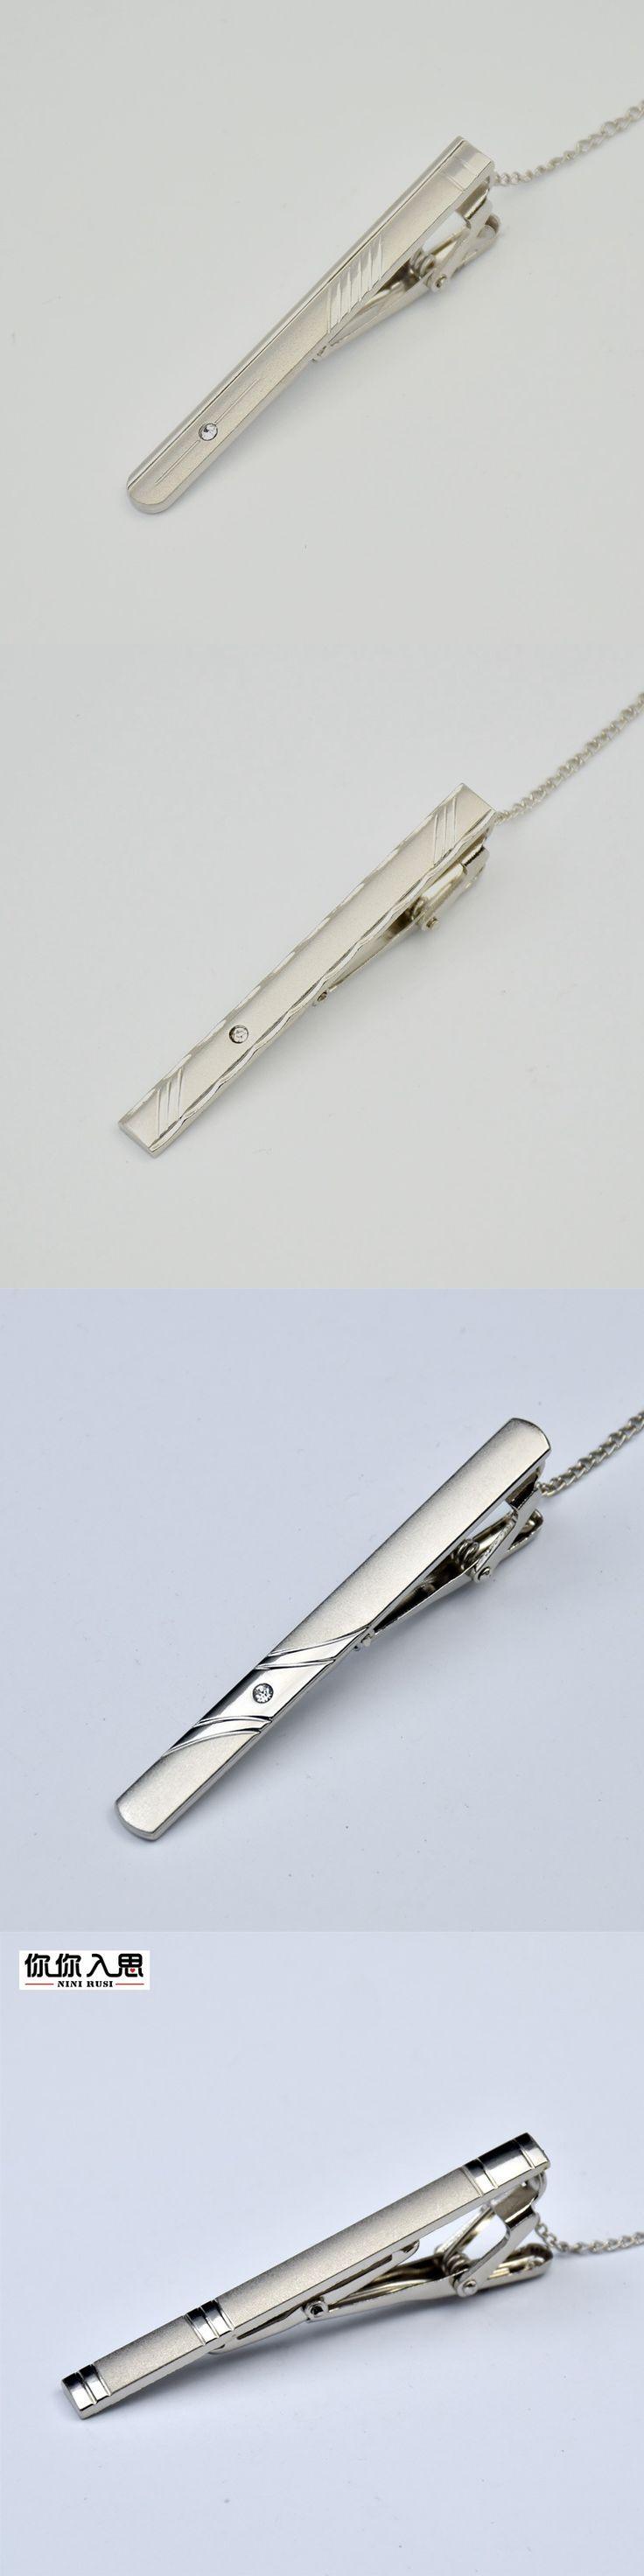 2016 New High quality Tie Bar Wood For Men's Tie clips High-grade hedgehog sandalwood Mens Business Wedding Tie Clip&Cuff links